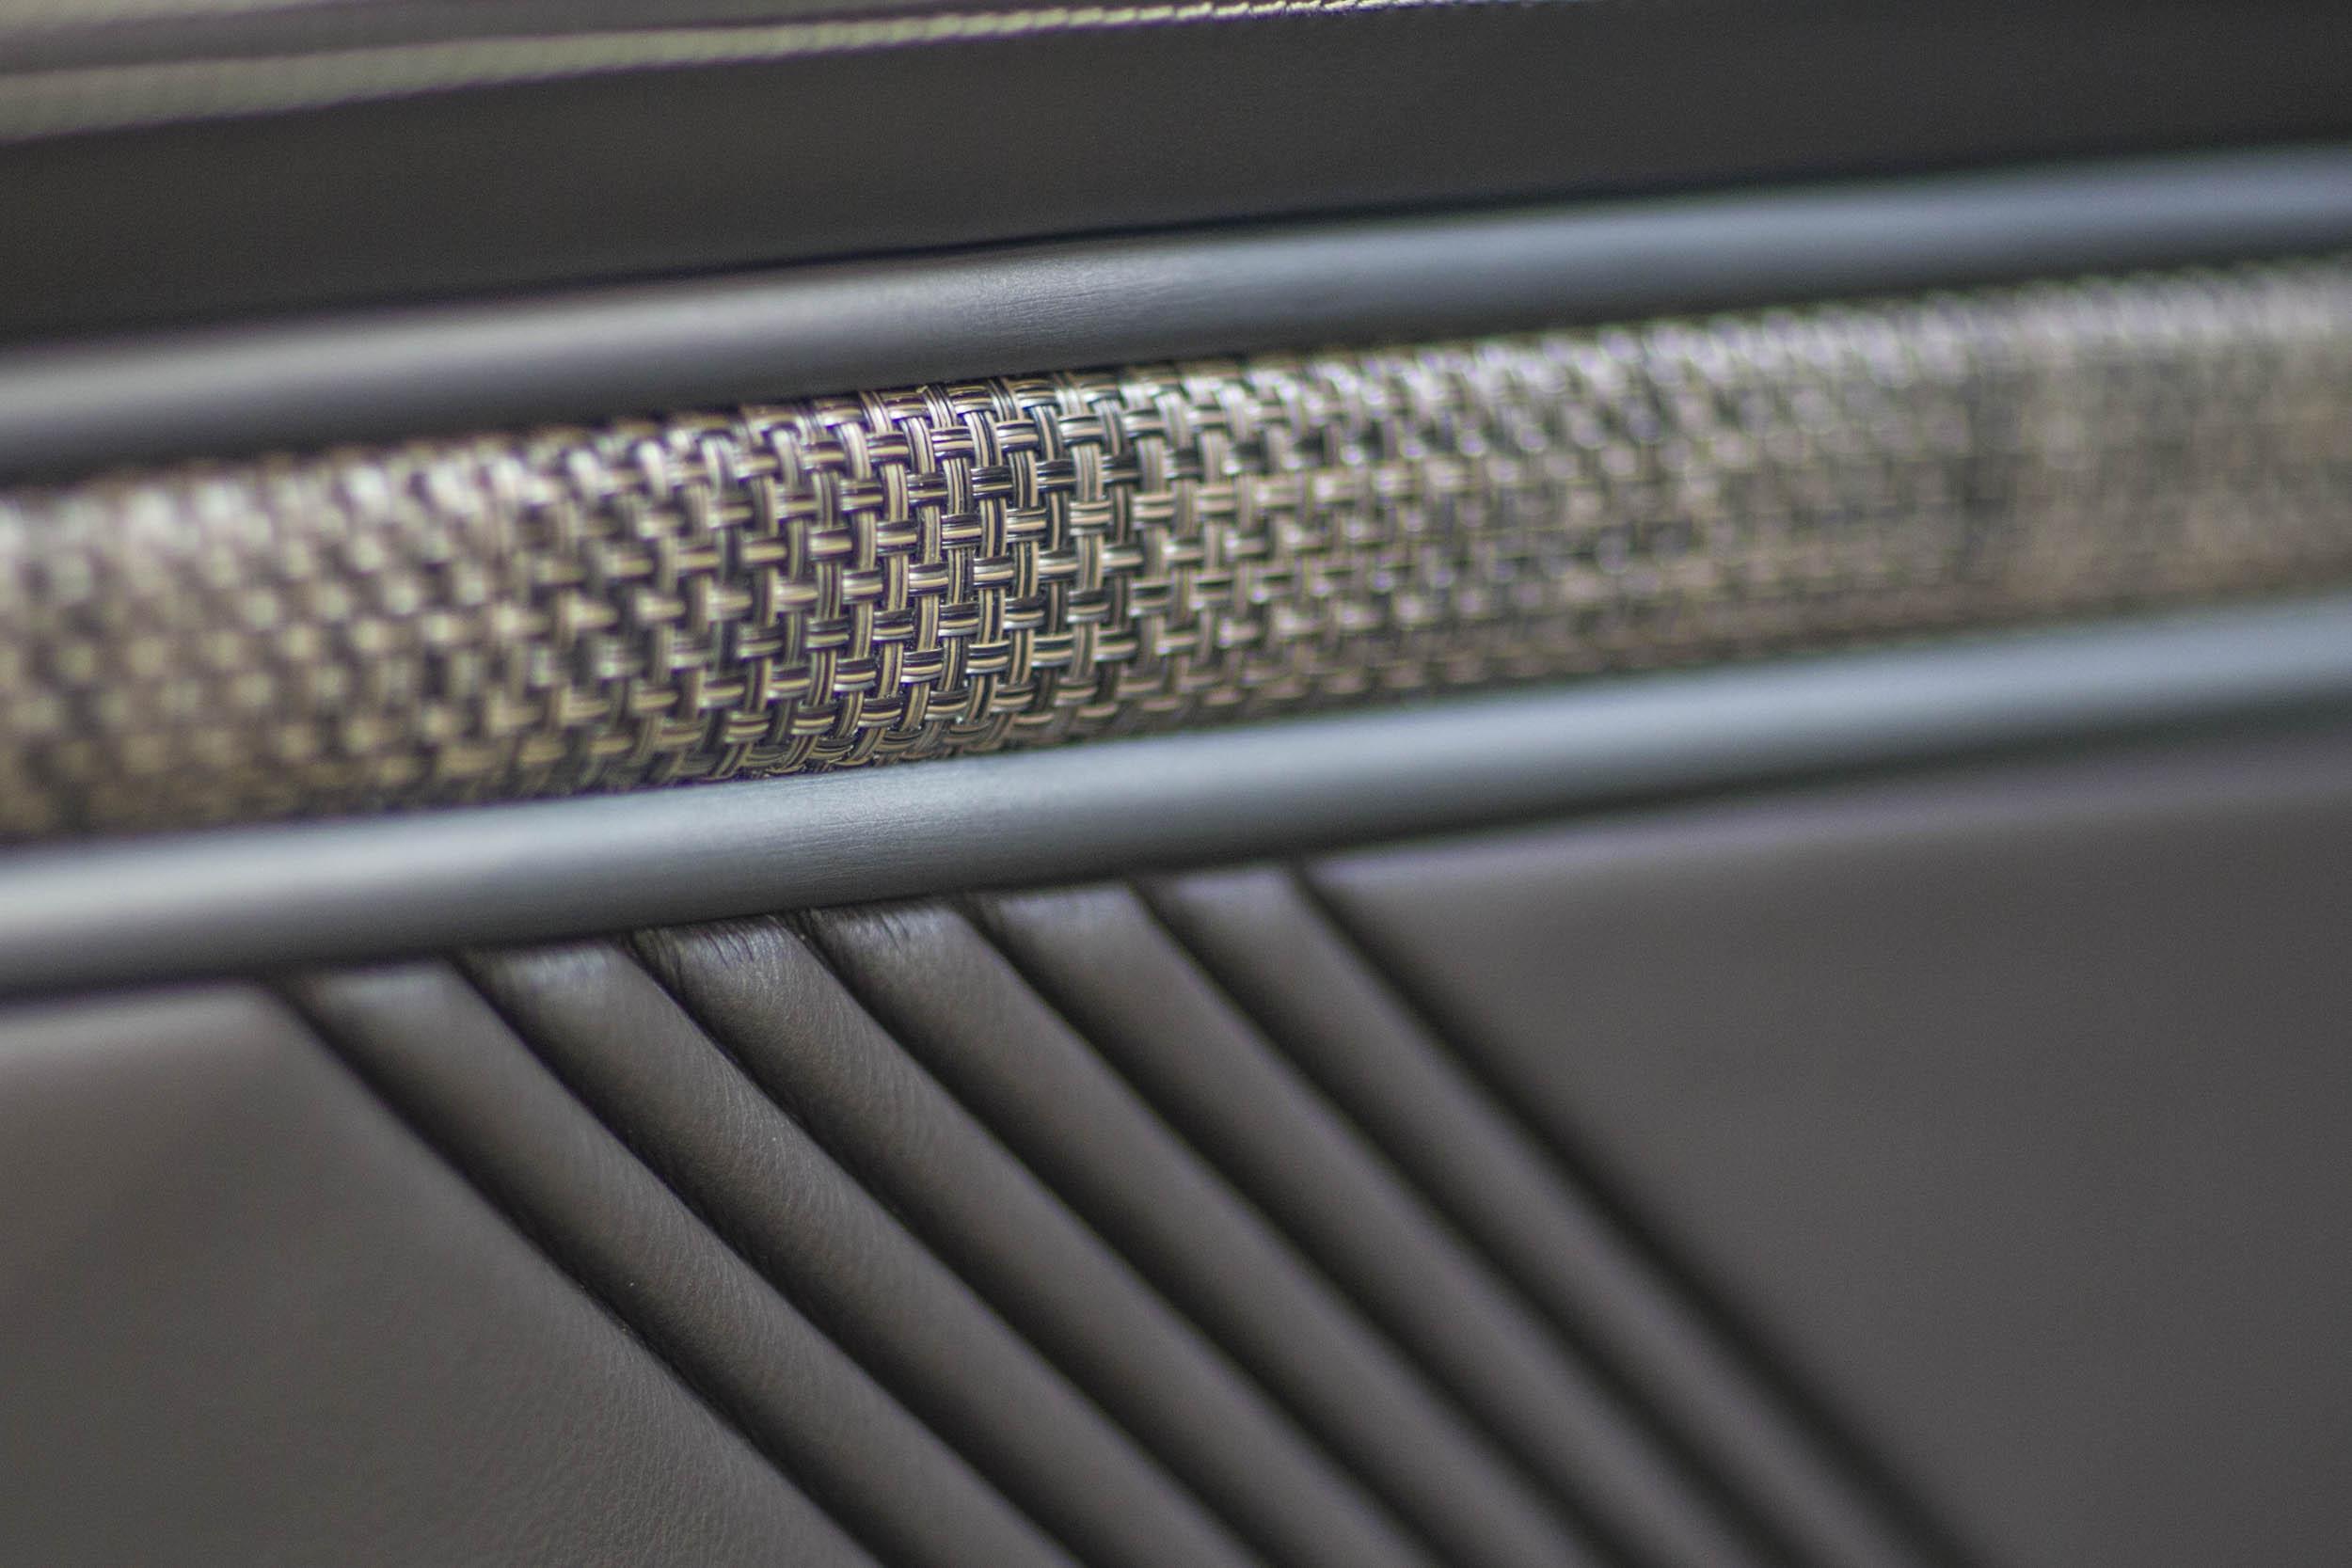 Speedkore 1970 Mustang interior cloth detail